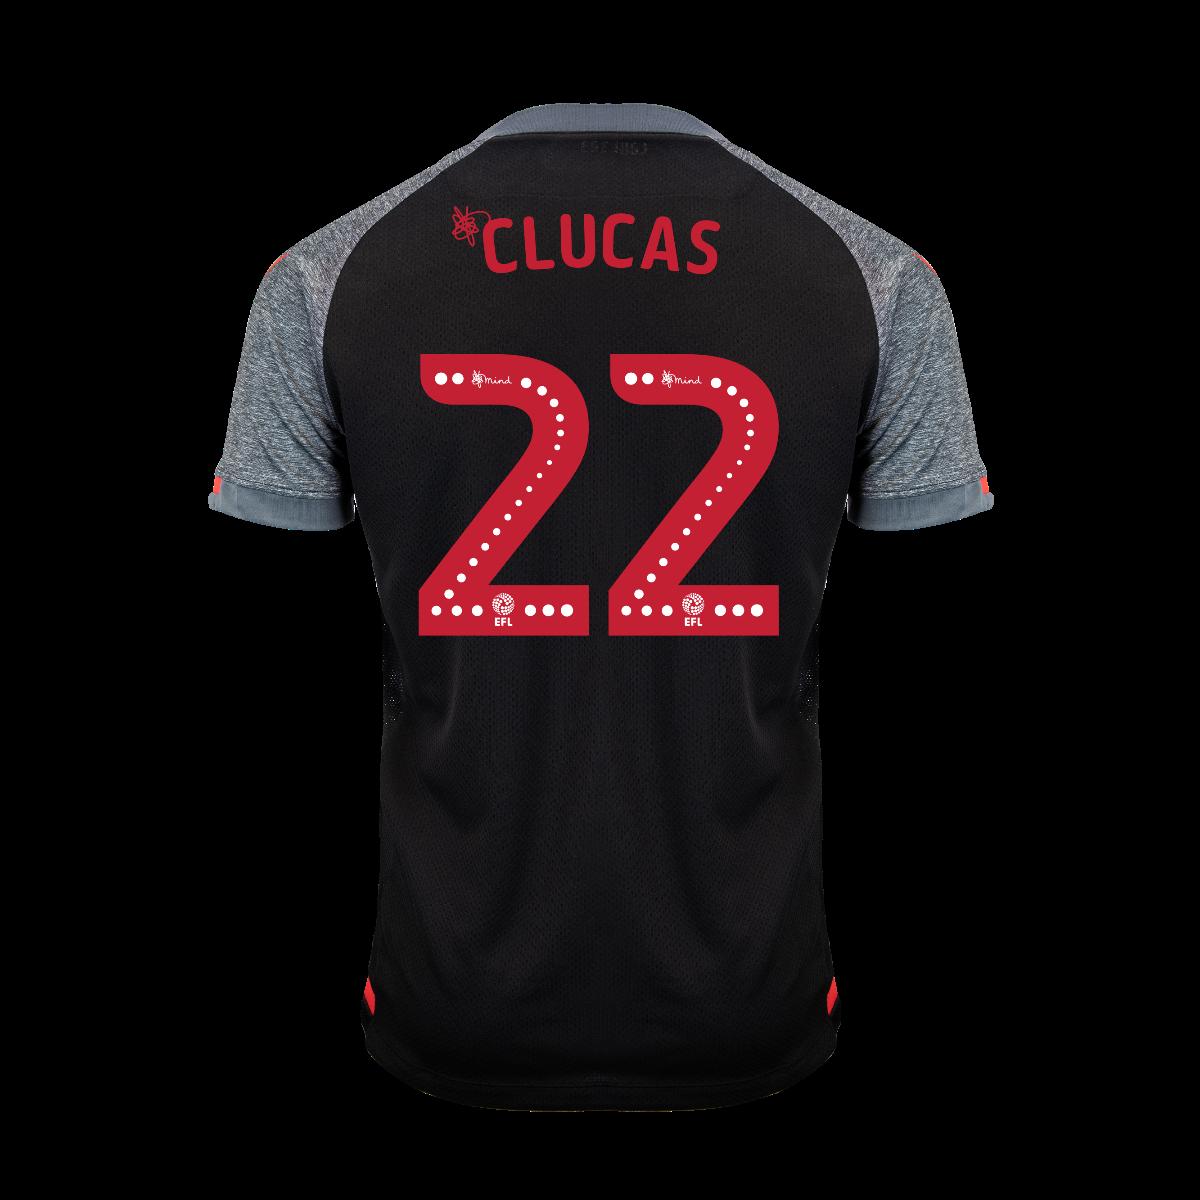 2019/20 Ladies Away Shirt - Clucas